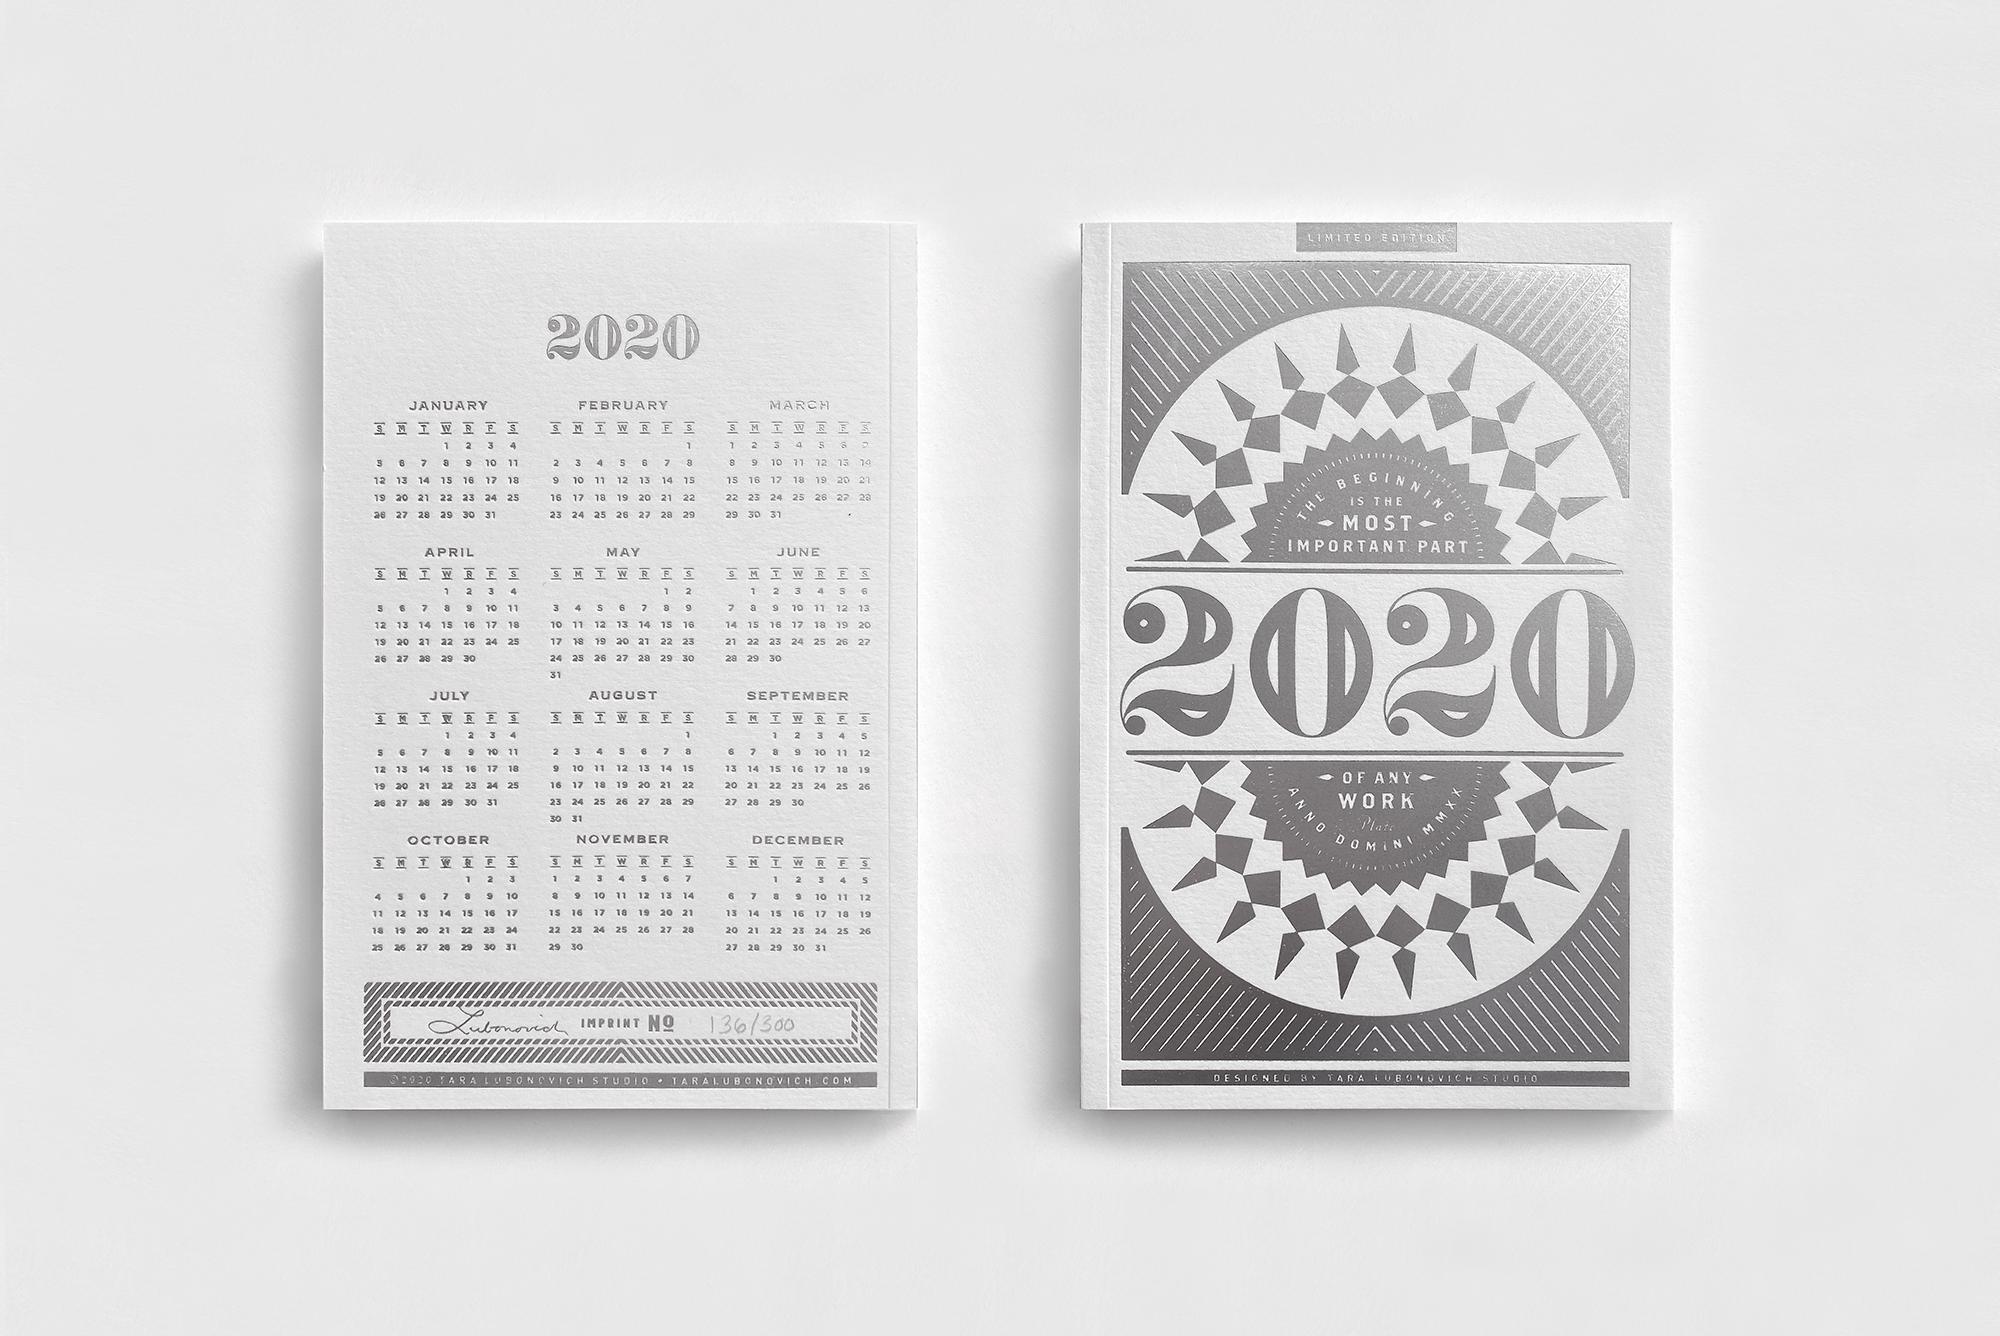 2020 Notebook calendar custom designed by Tara Lubonovich